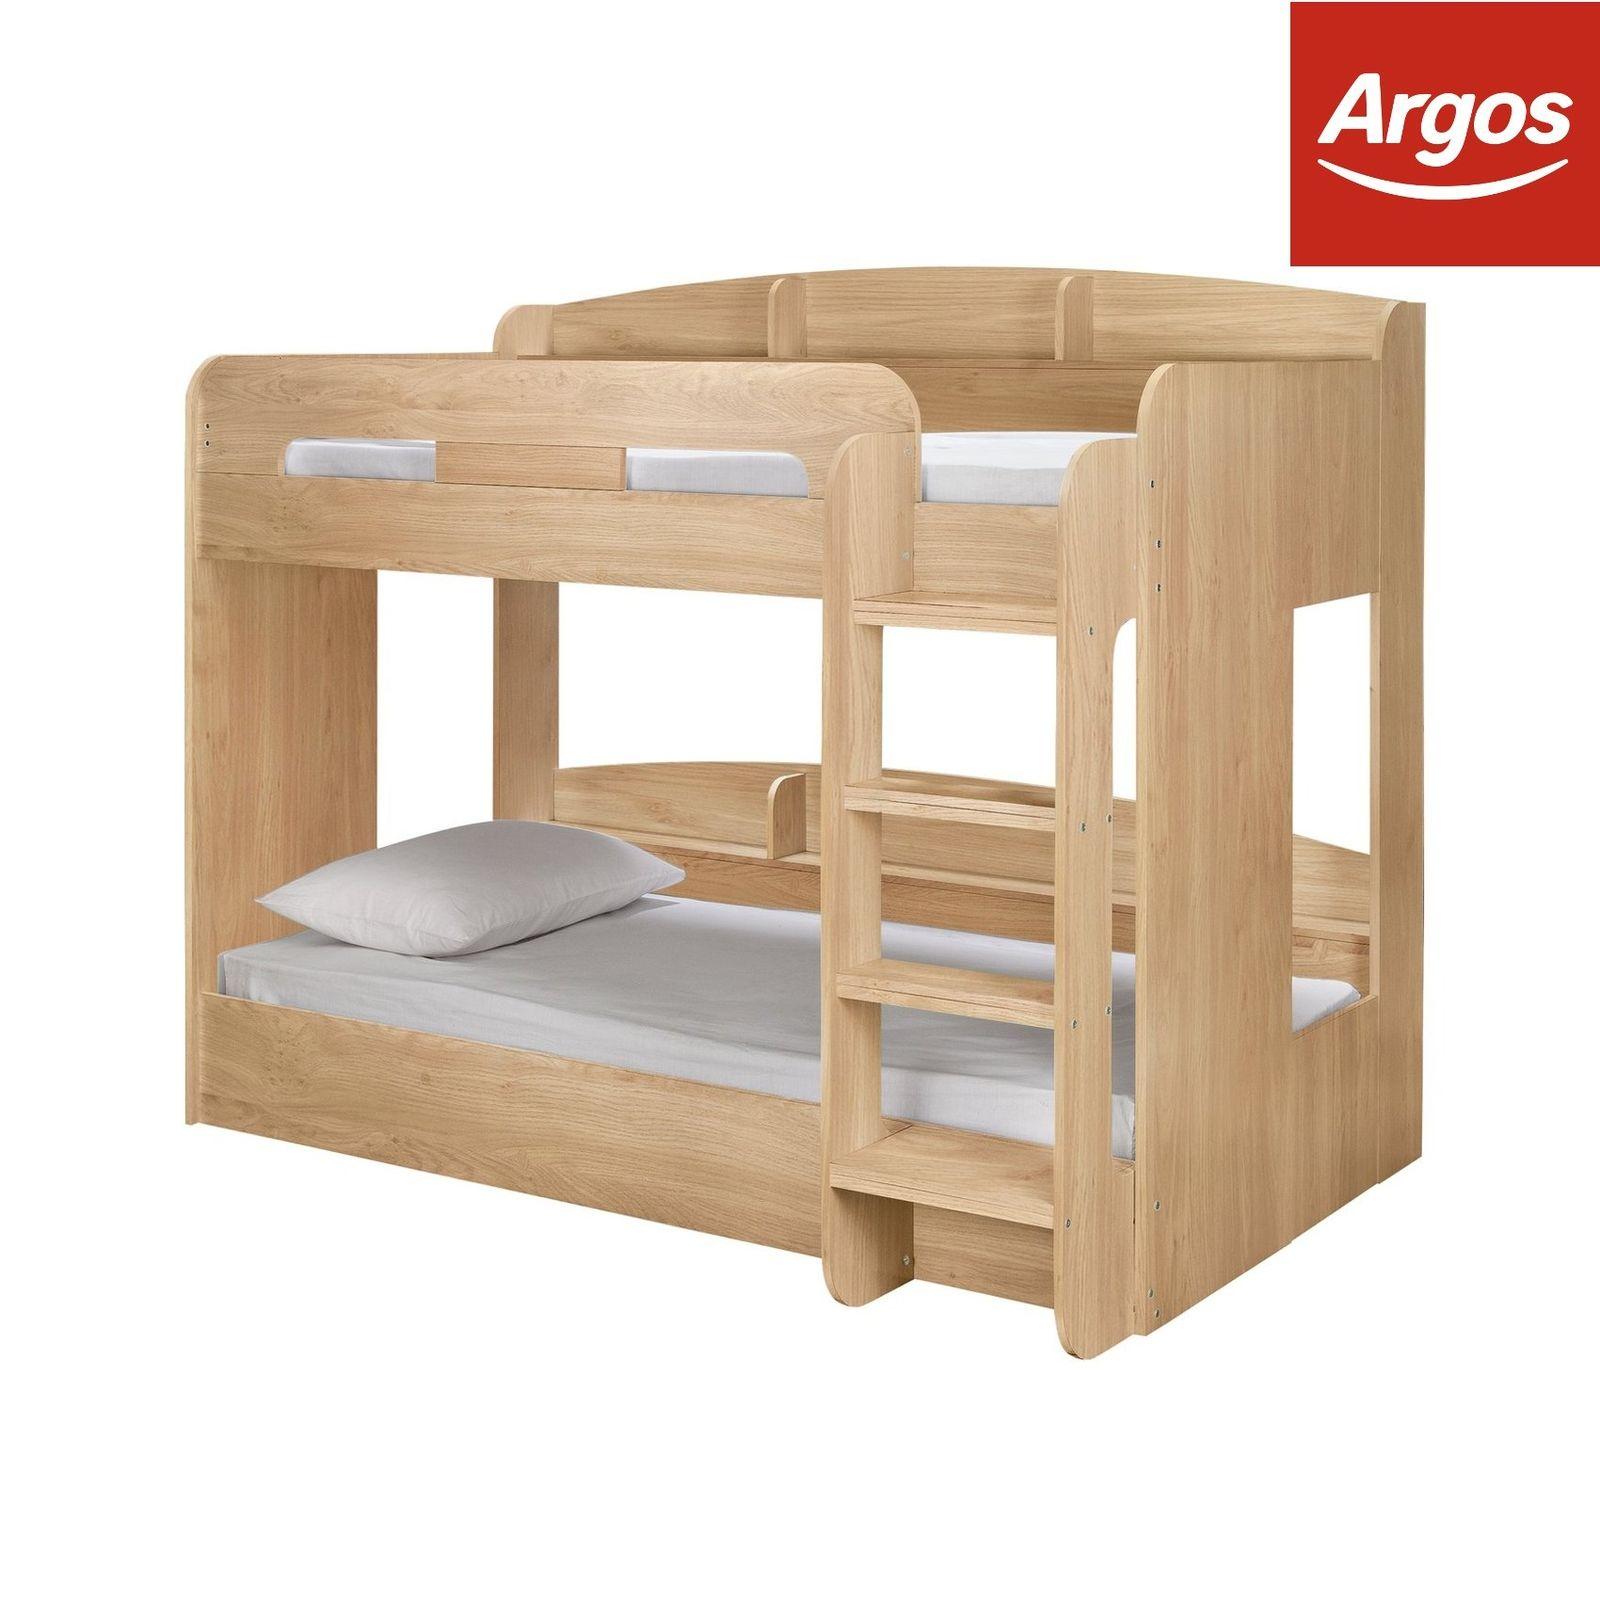 Argos Home Ultimate Oak Effect Single Bunk Bed - £149.99 @ Argos eBay